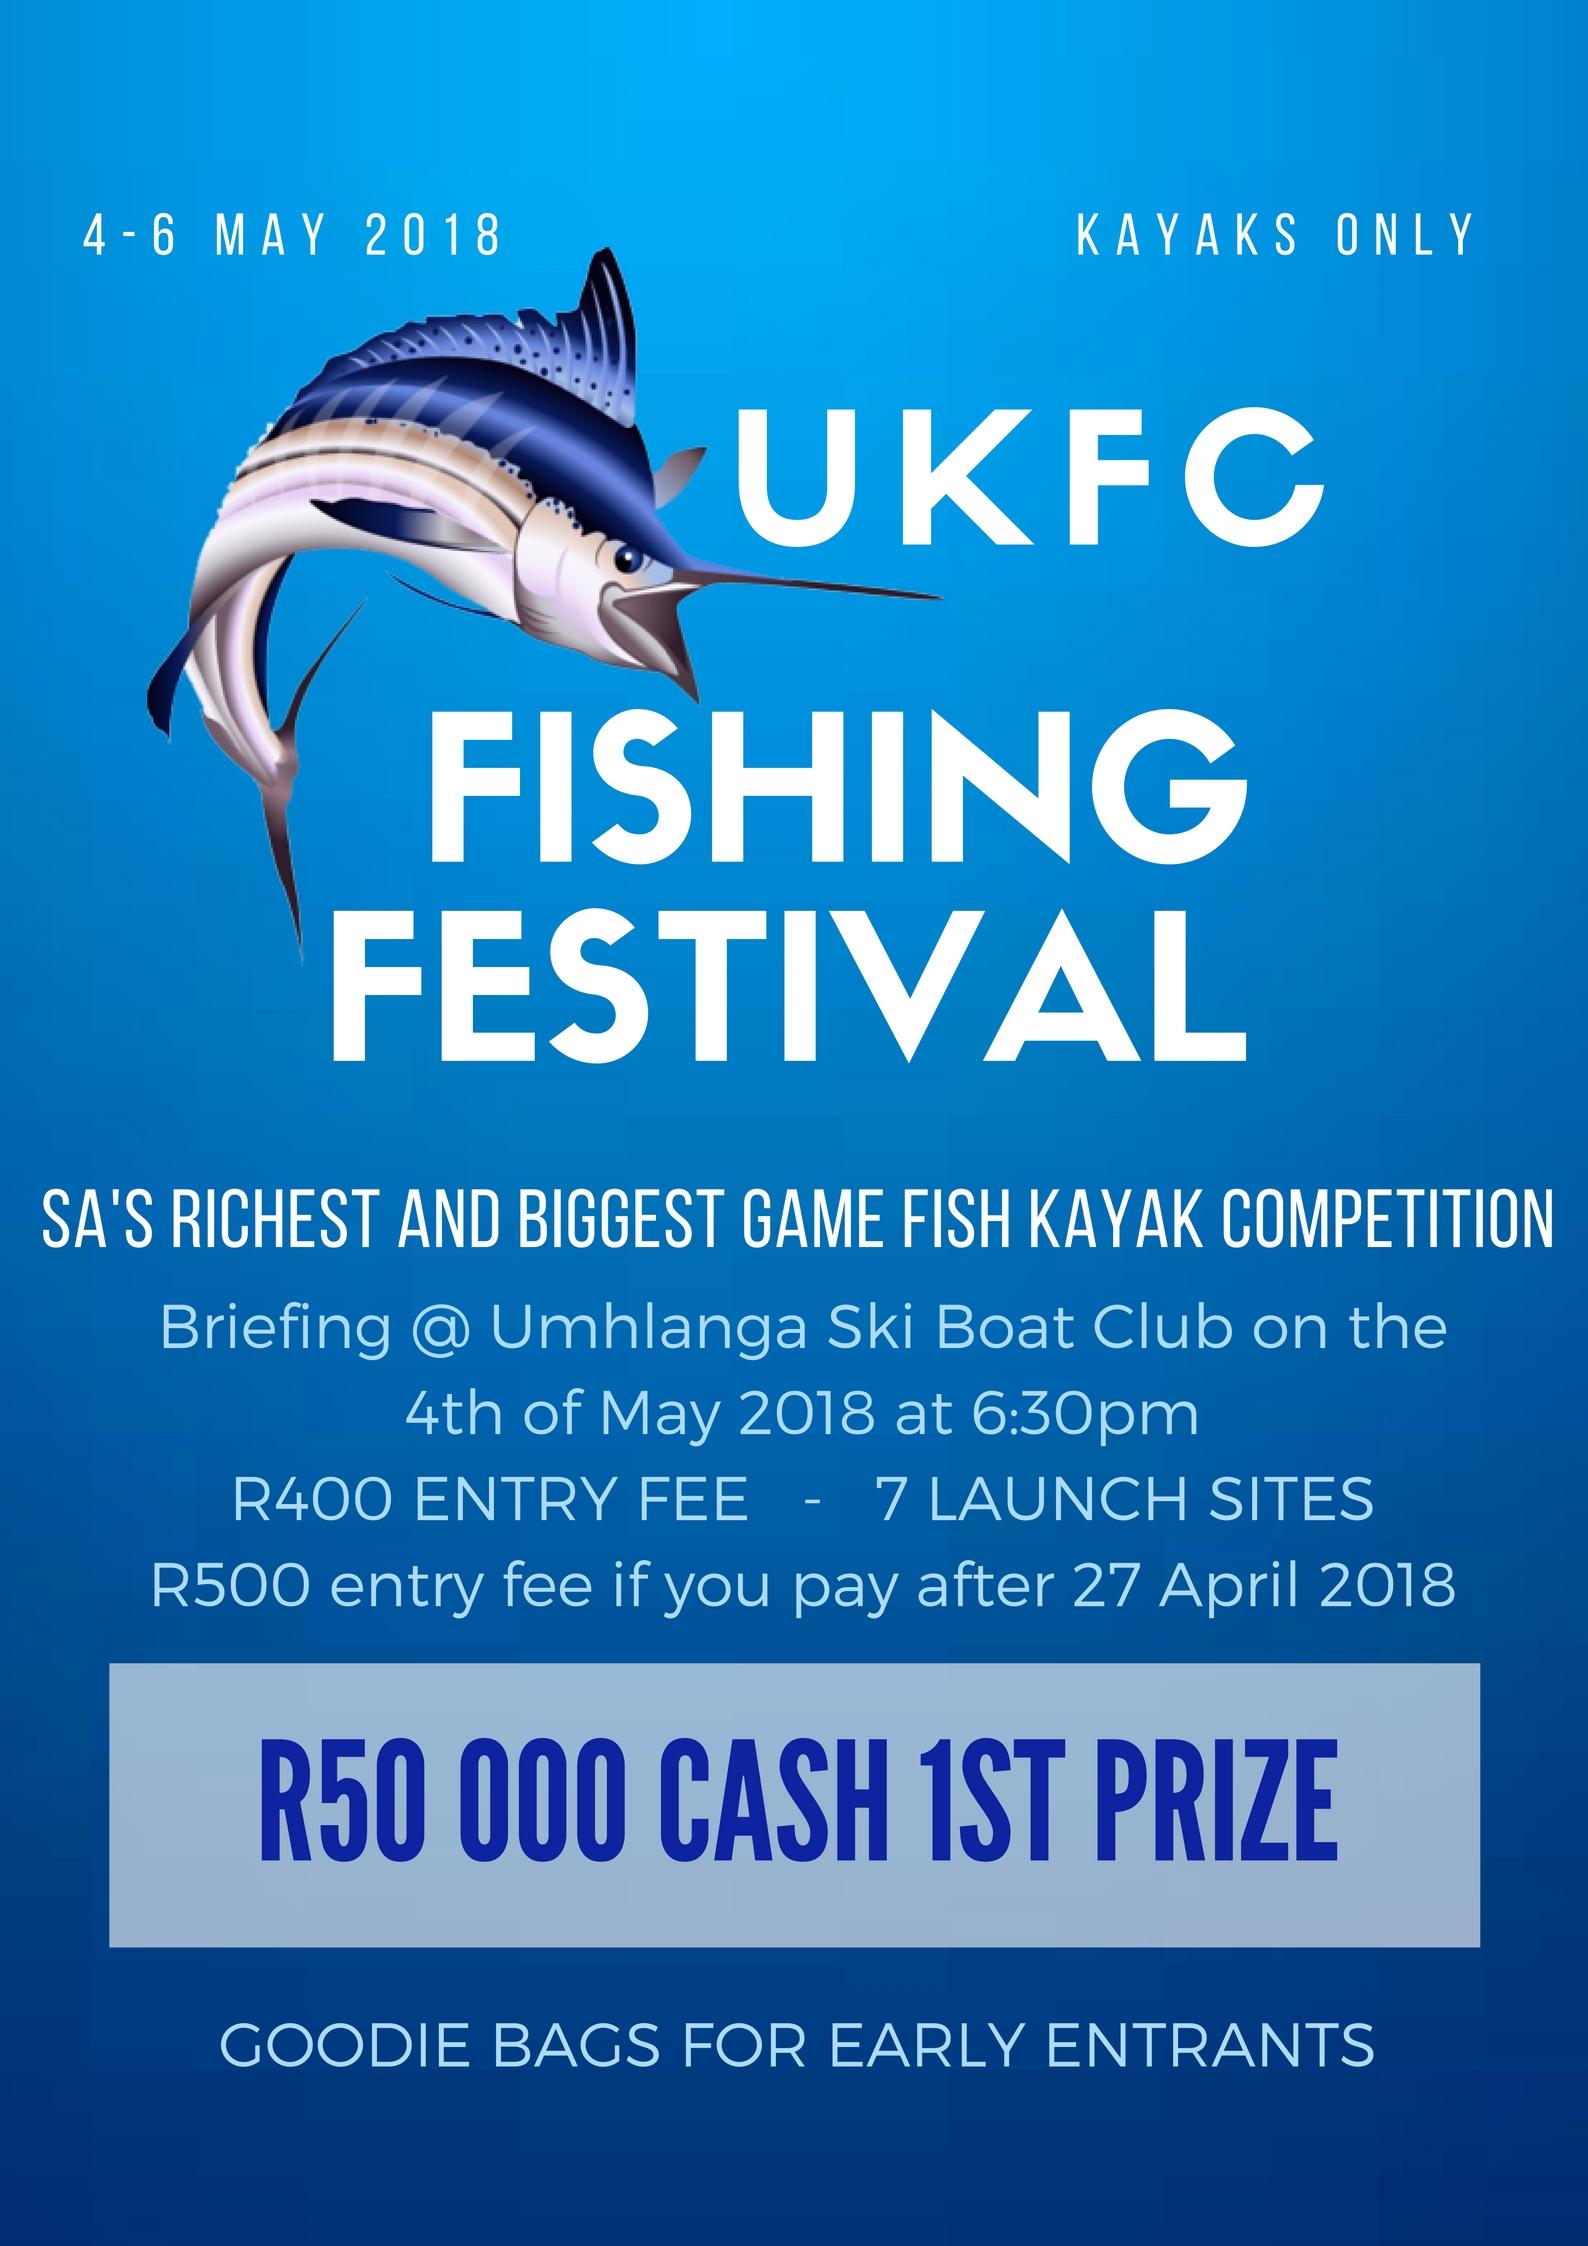 UKFC FISHING FESTIVAL (2)